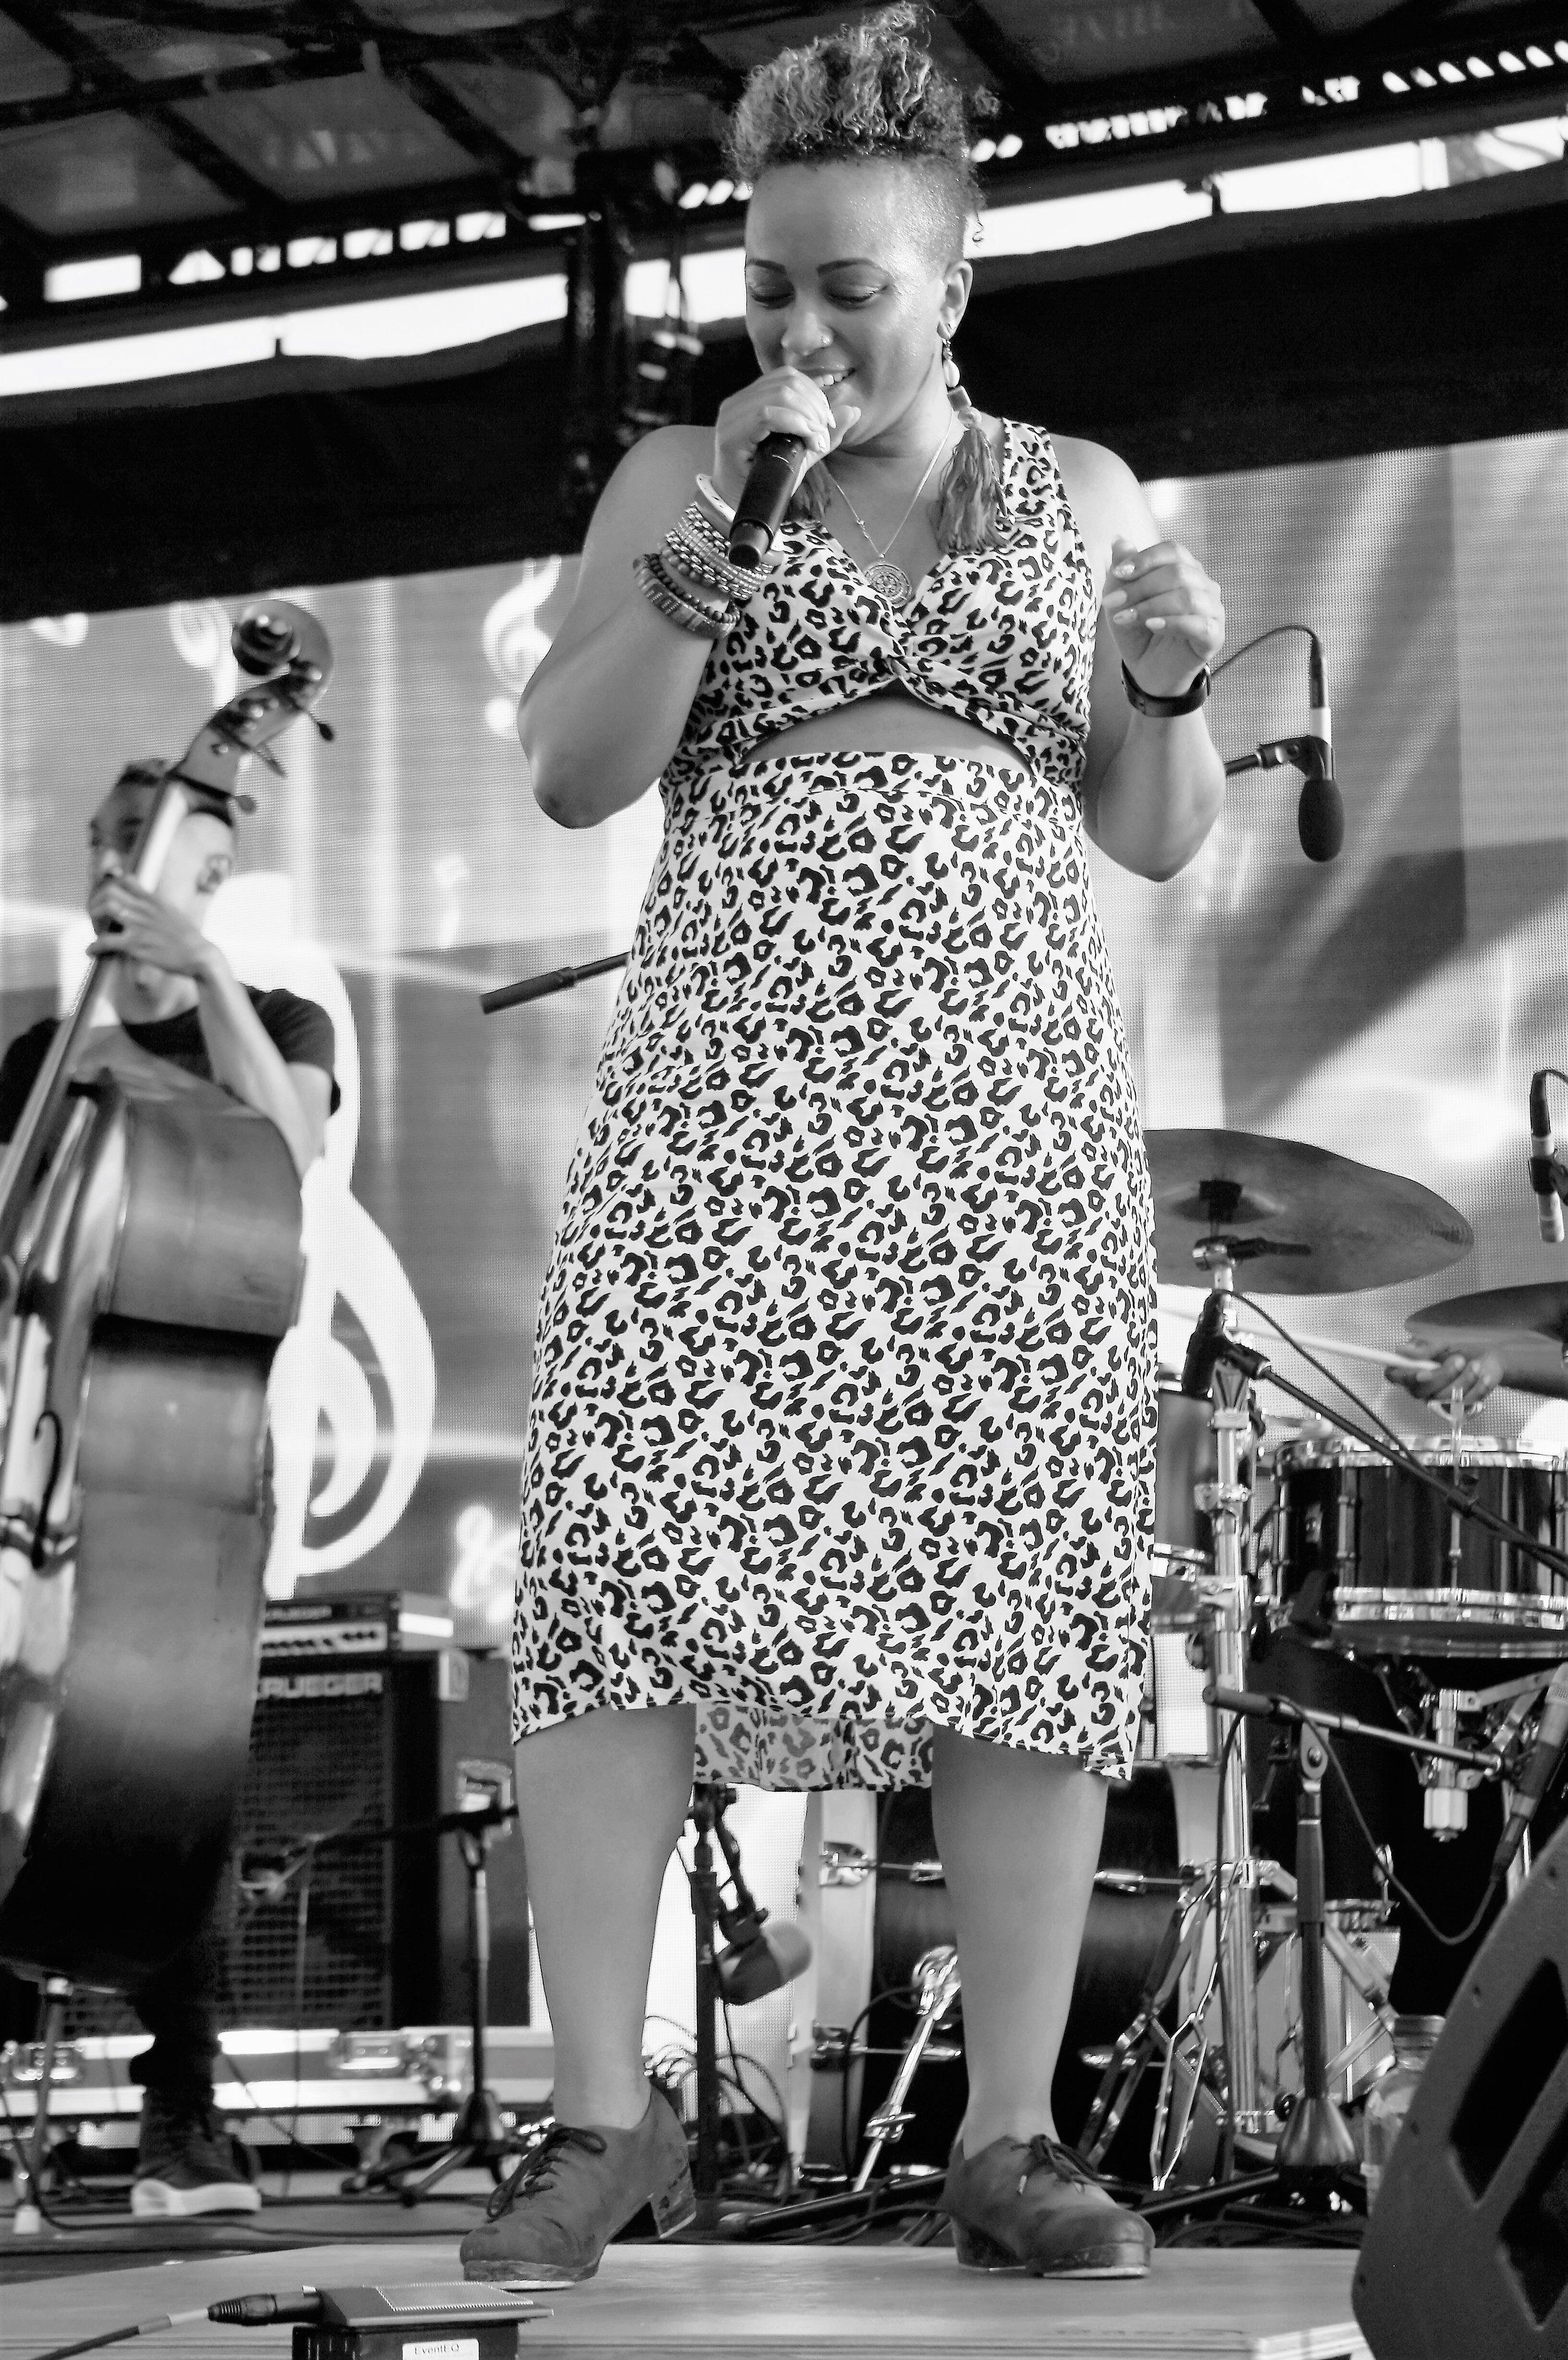 tap dancer Brinae Ali performing with Sean Jones' Dizzy Spellz at The Wharf on 6/16/19 (photo by Bridget Arnwine)